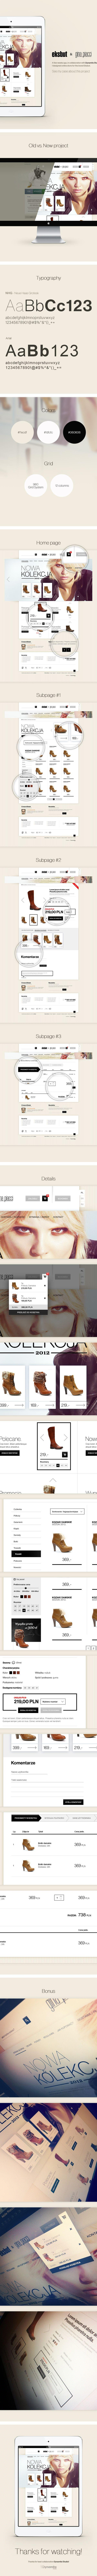 Eksbut e-shop by Adam Rudzki on Behance